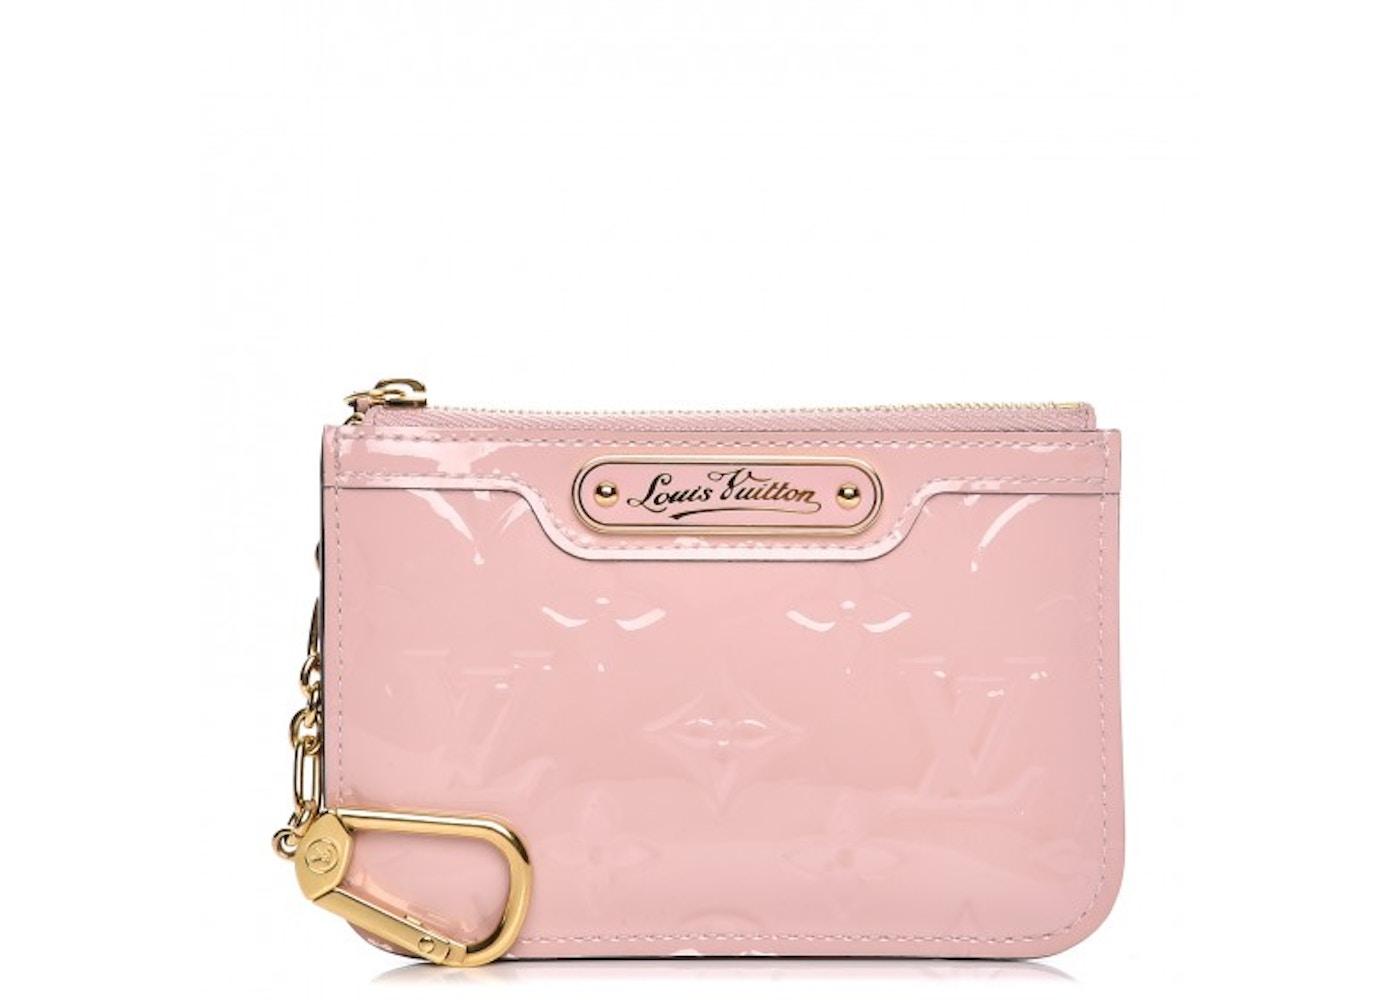 96a2b2797e Louis Vuitton Key Pouch Monogram Vernis Rose Ballerine